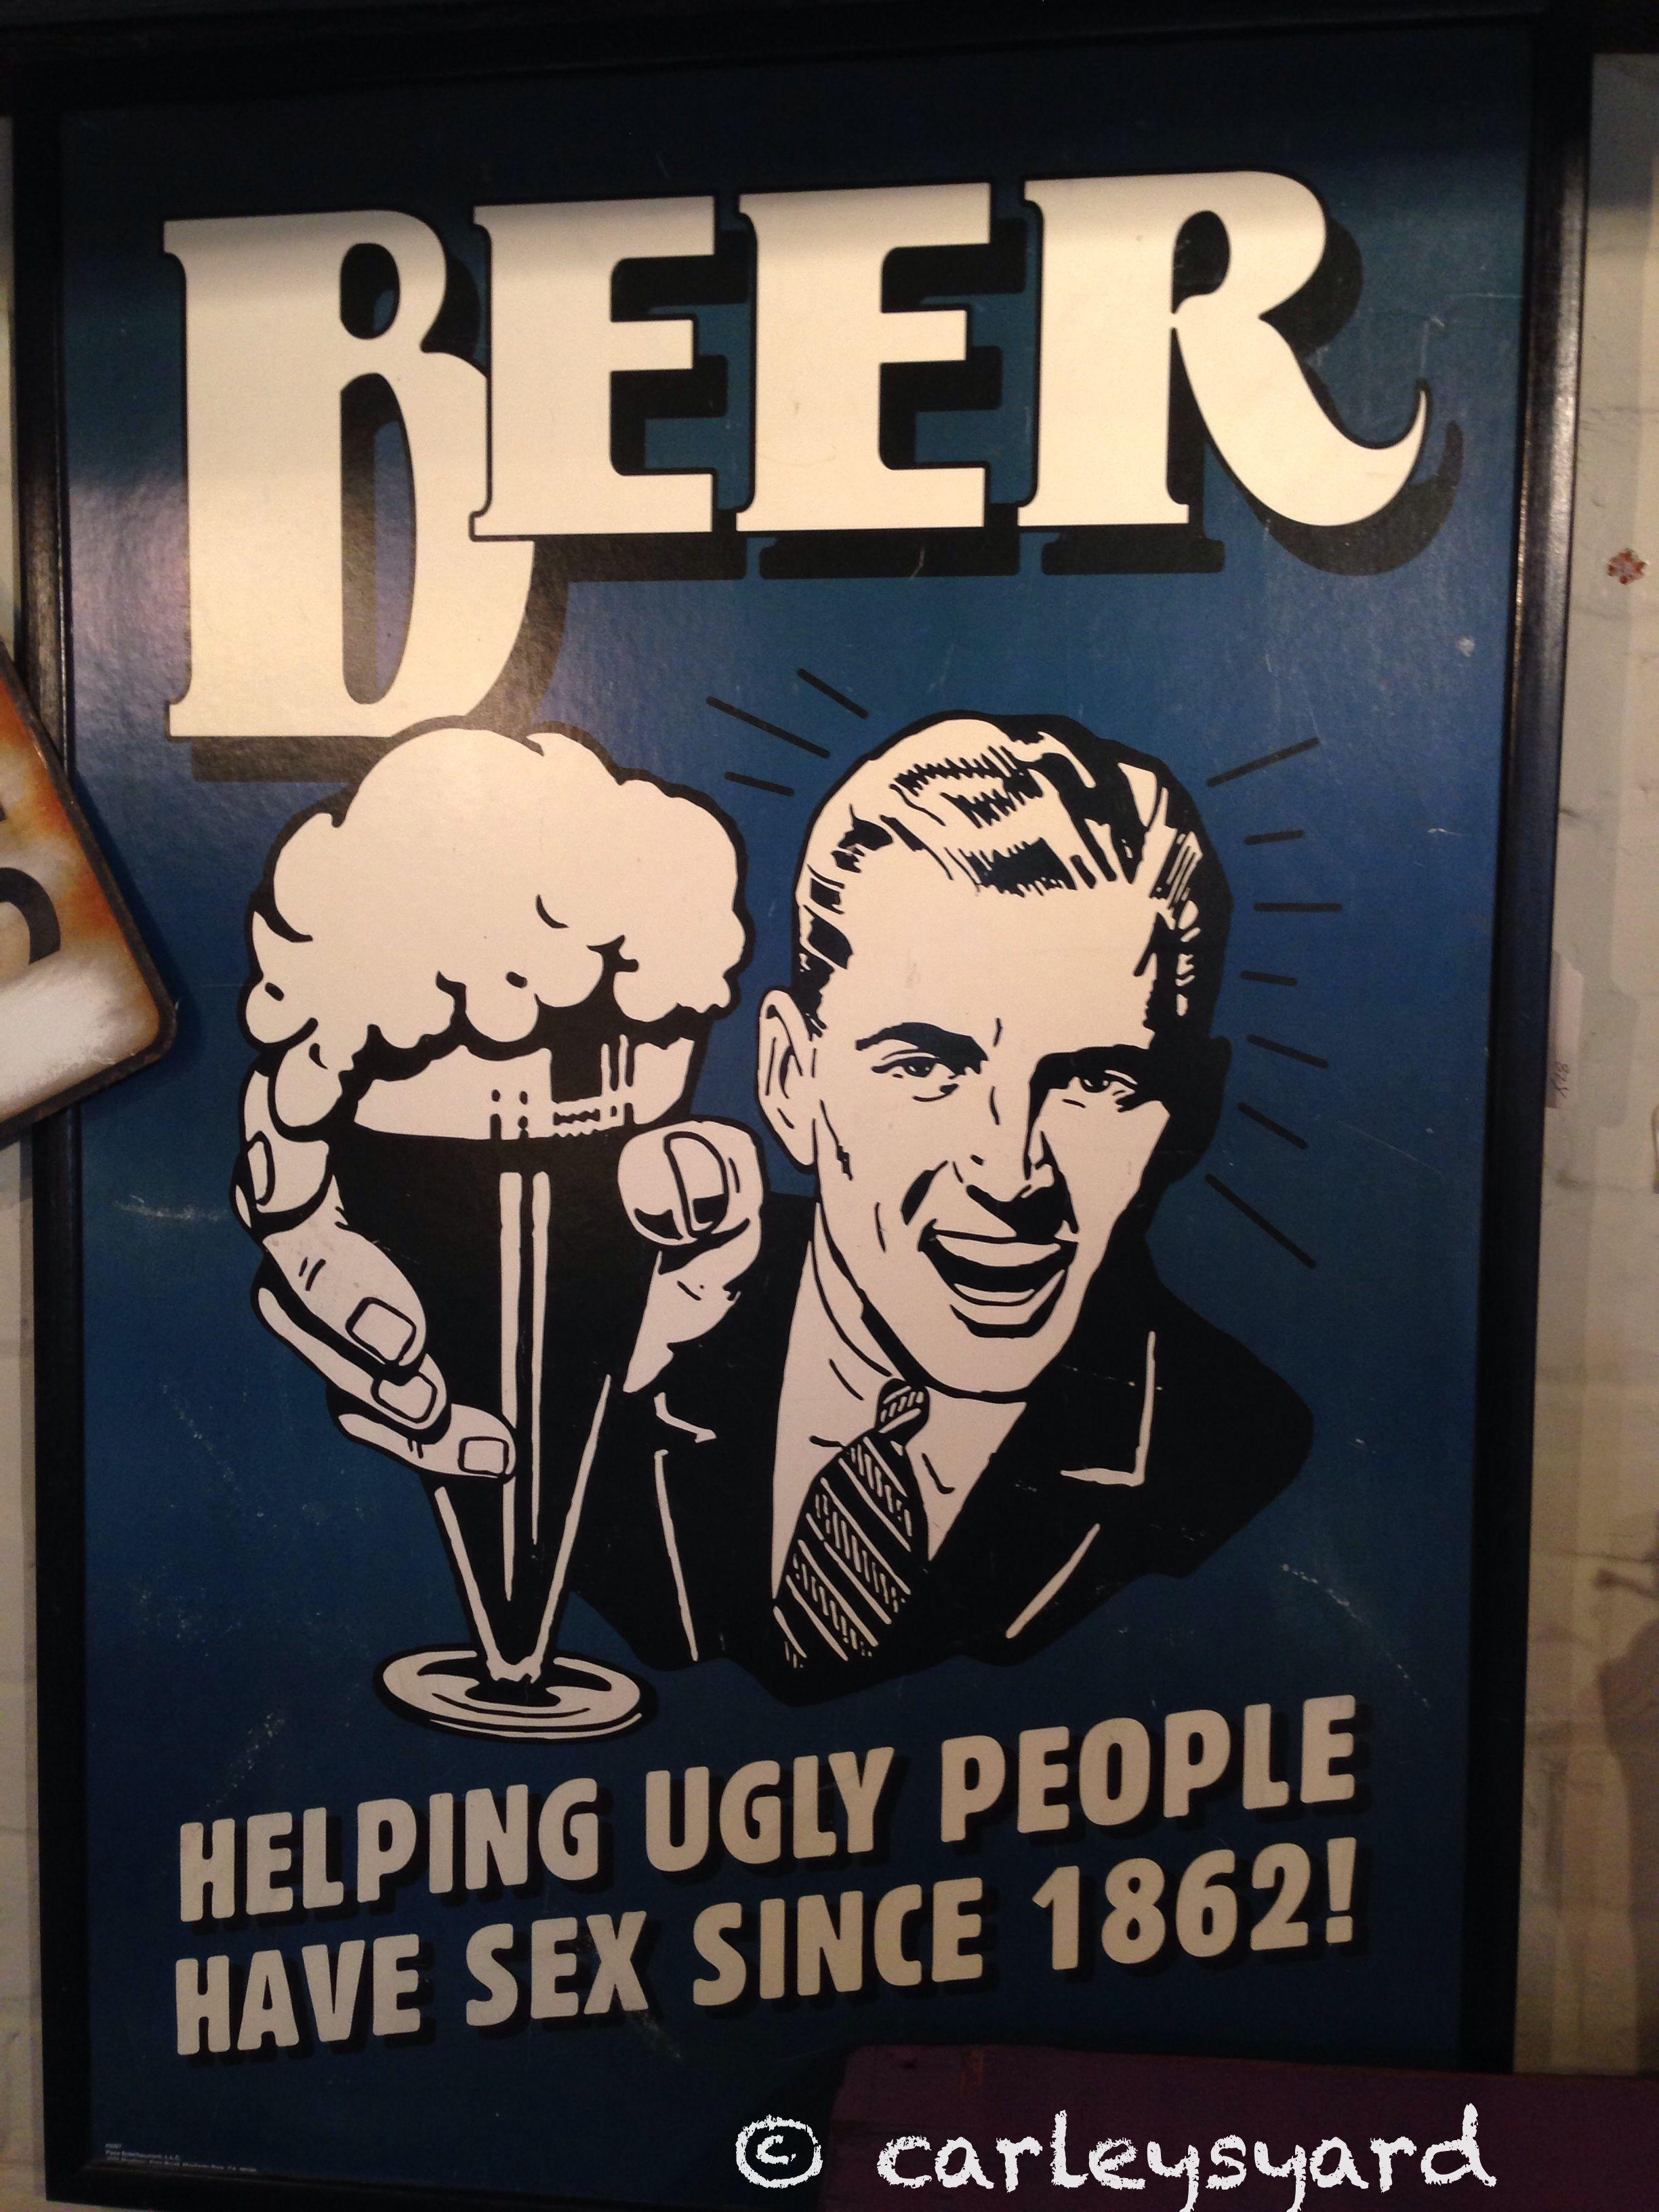 People beer sex ugly helping have